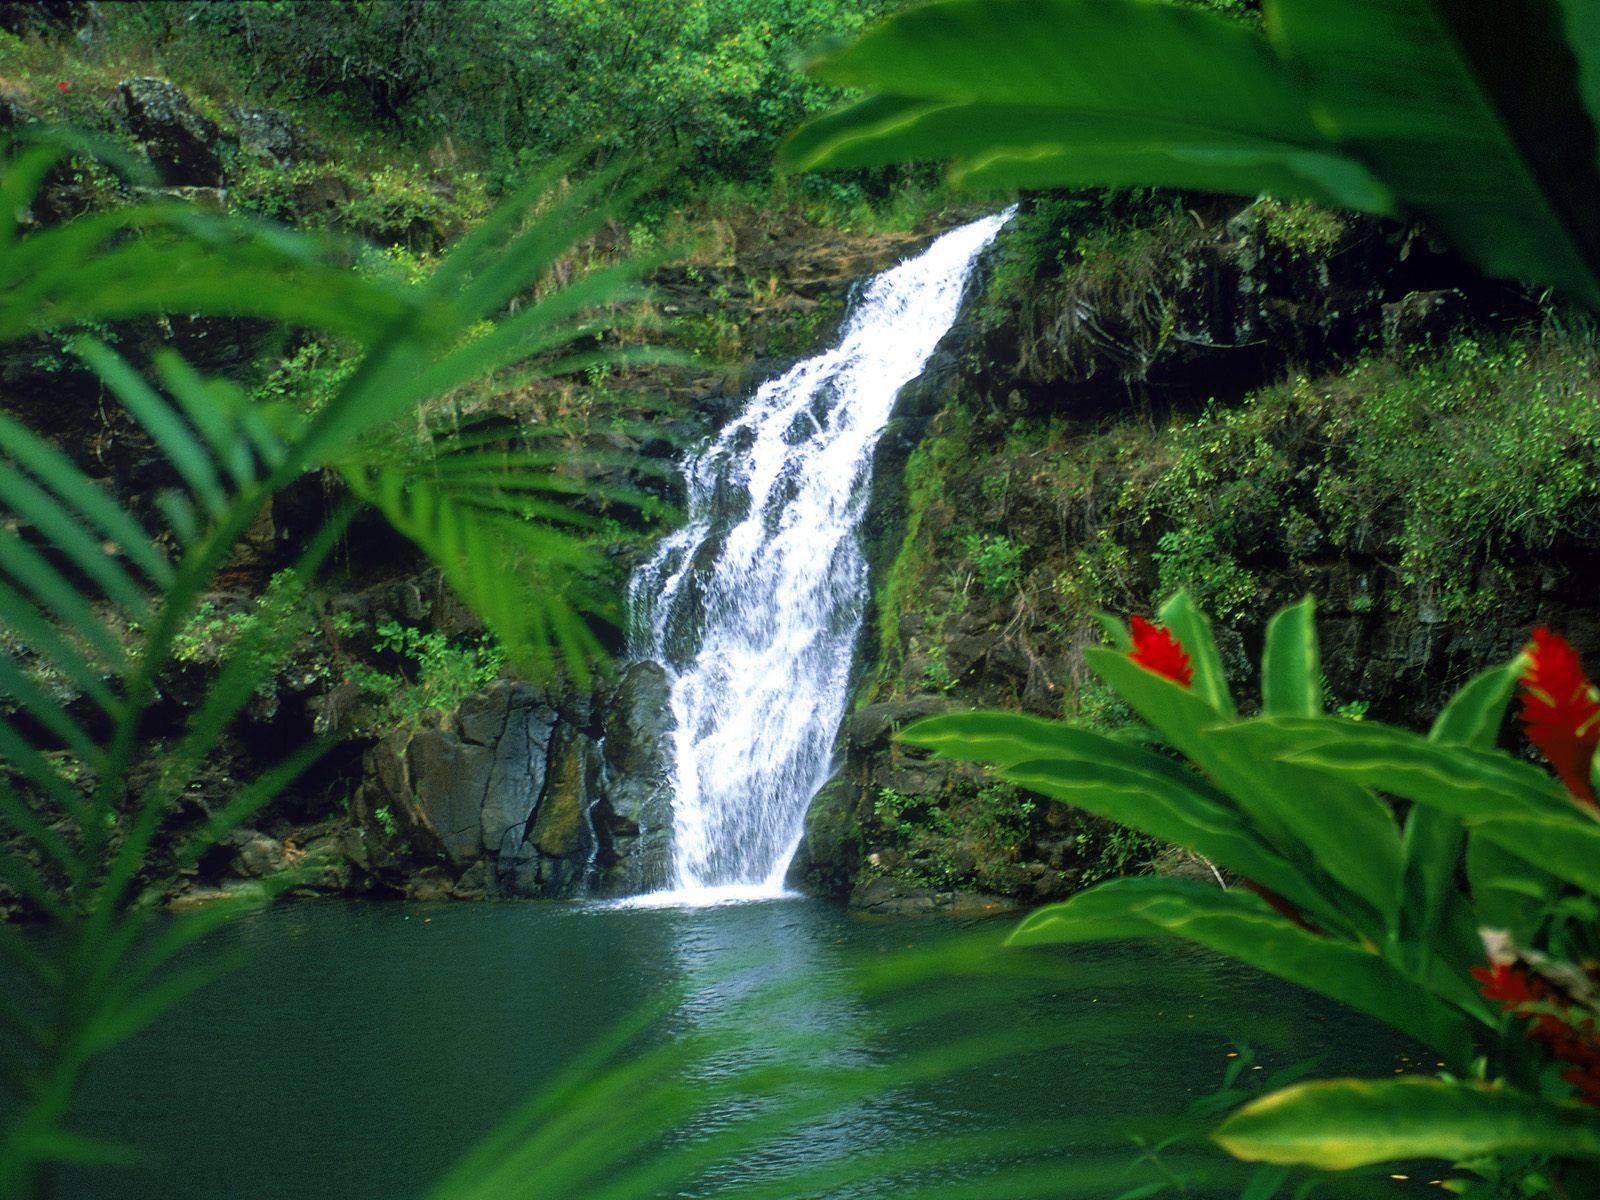 Home огонь изумруды водопады абик